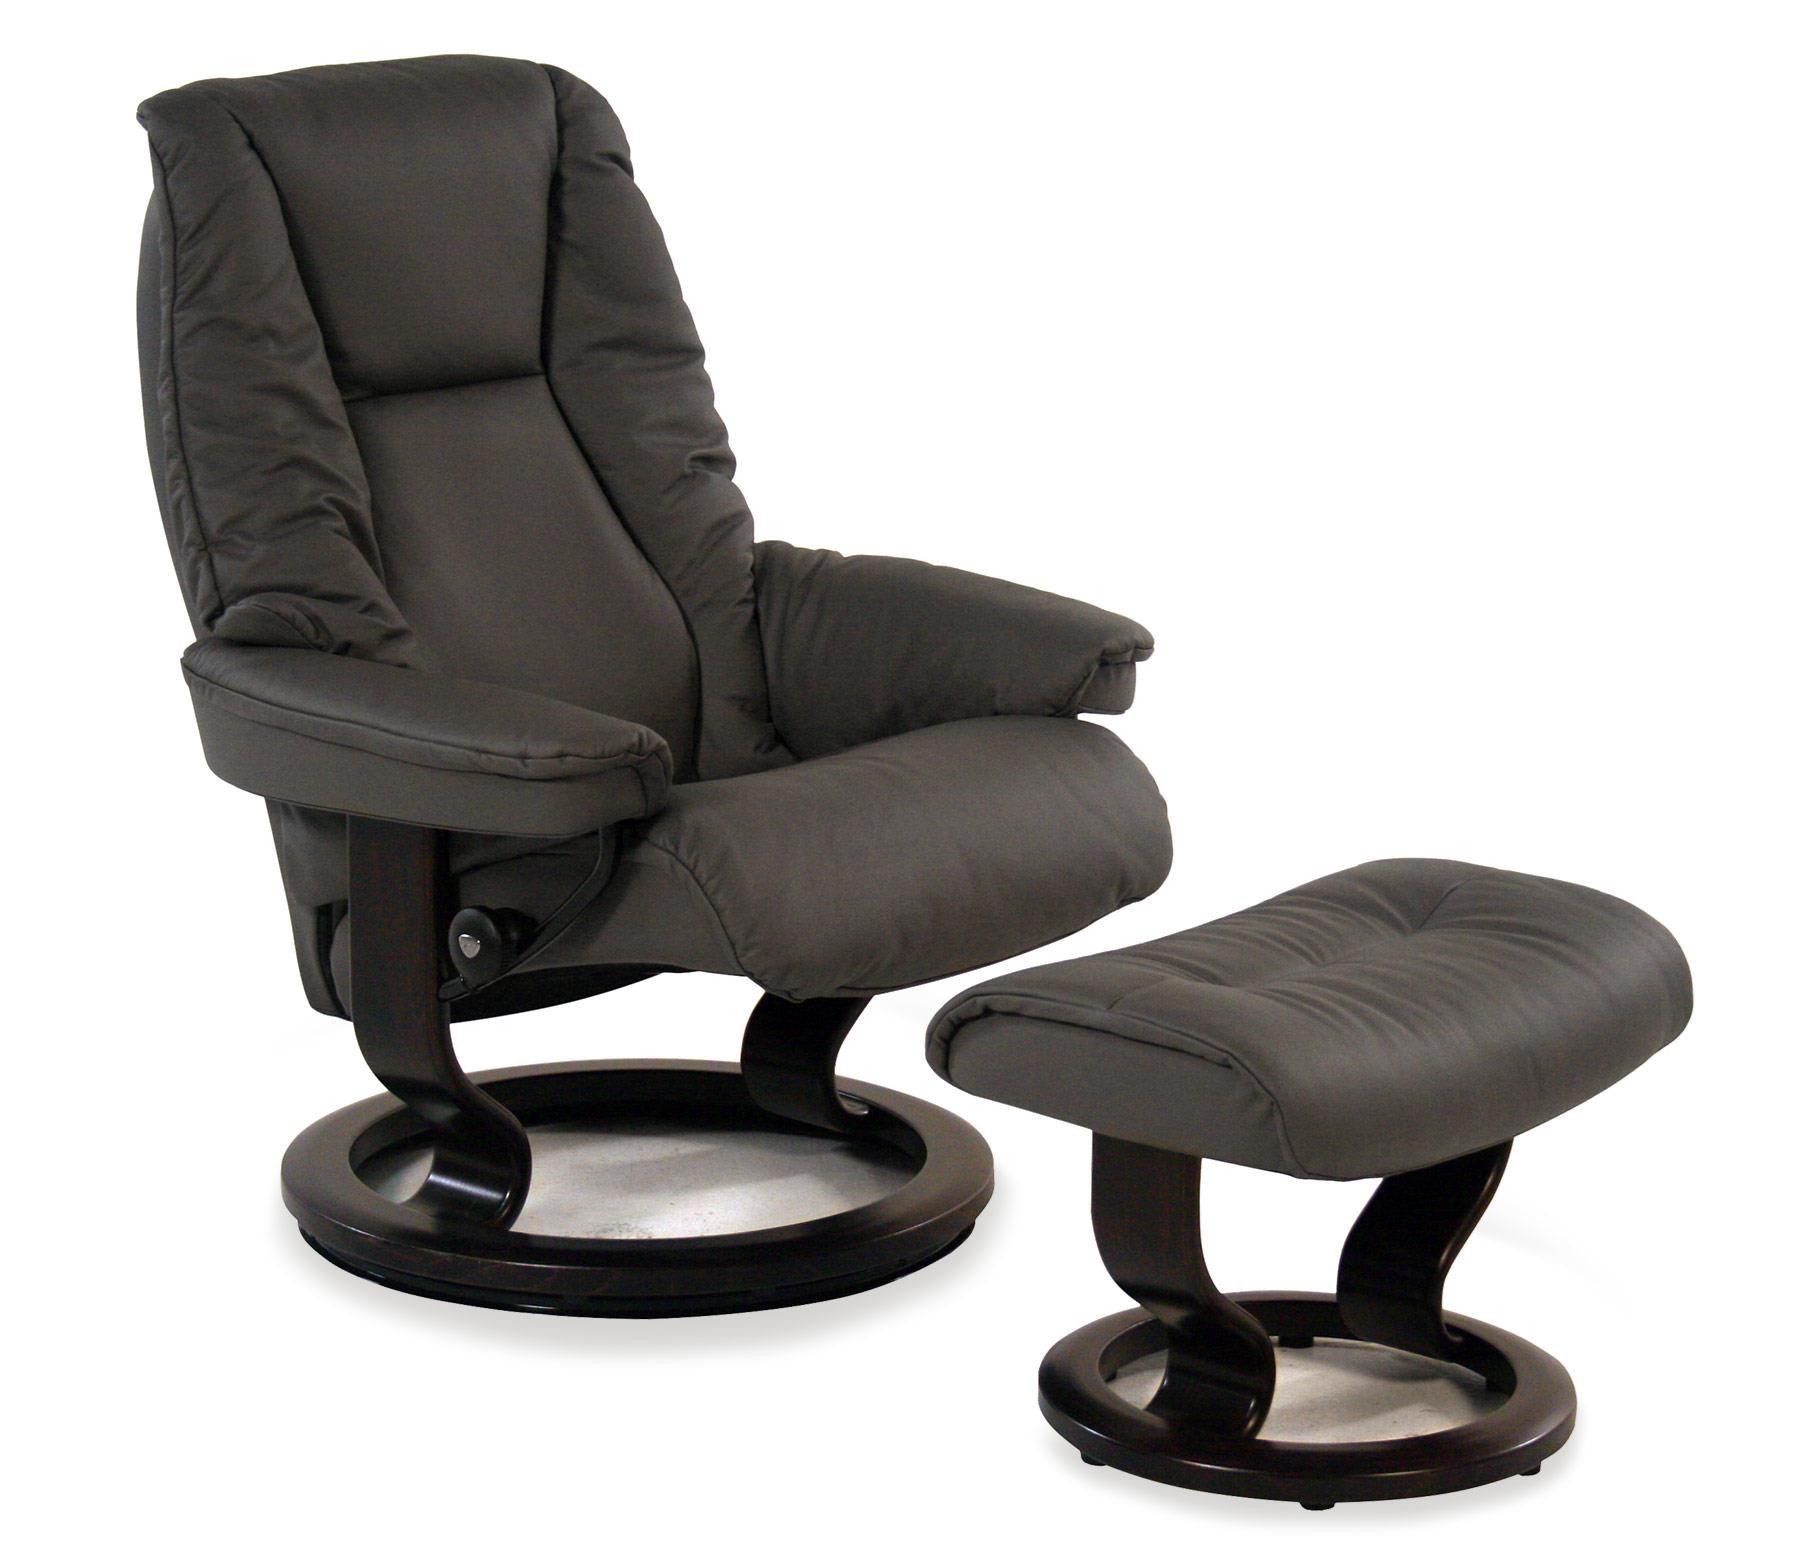 Stressless By Ekornes LiveMedium Classic Chair